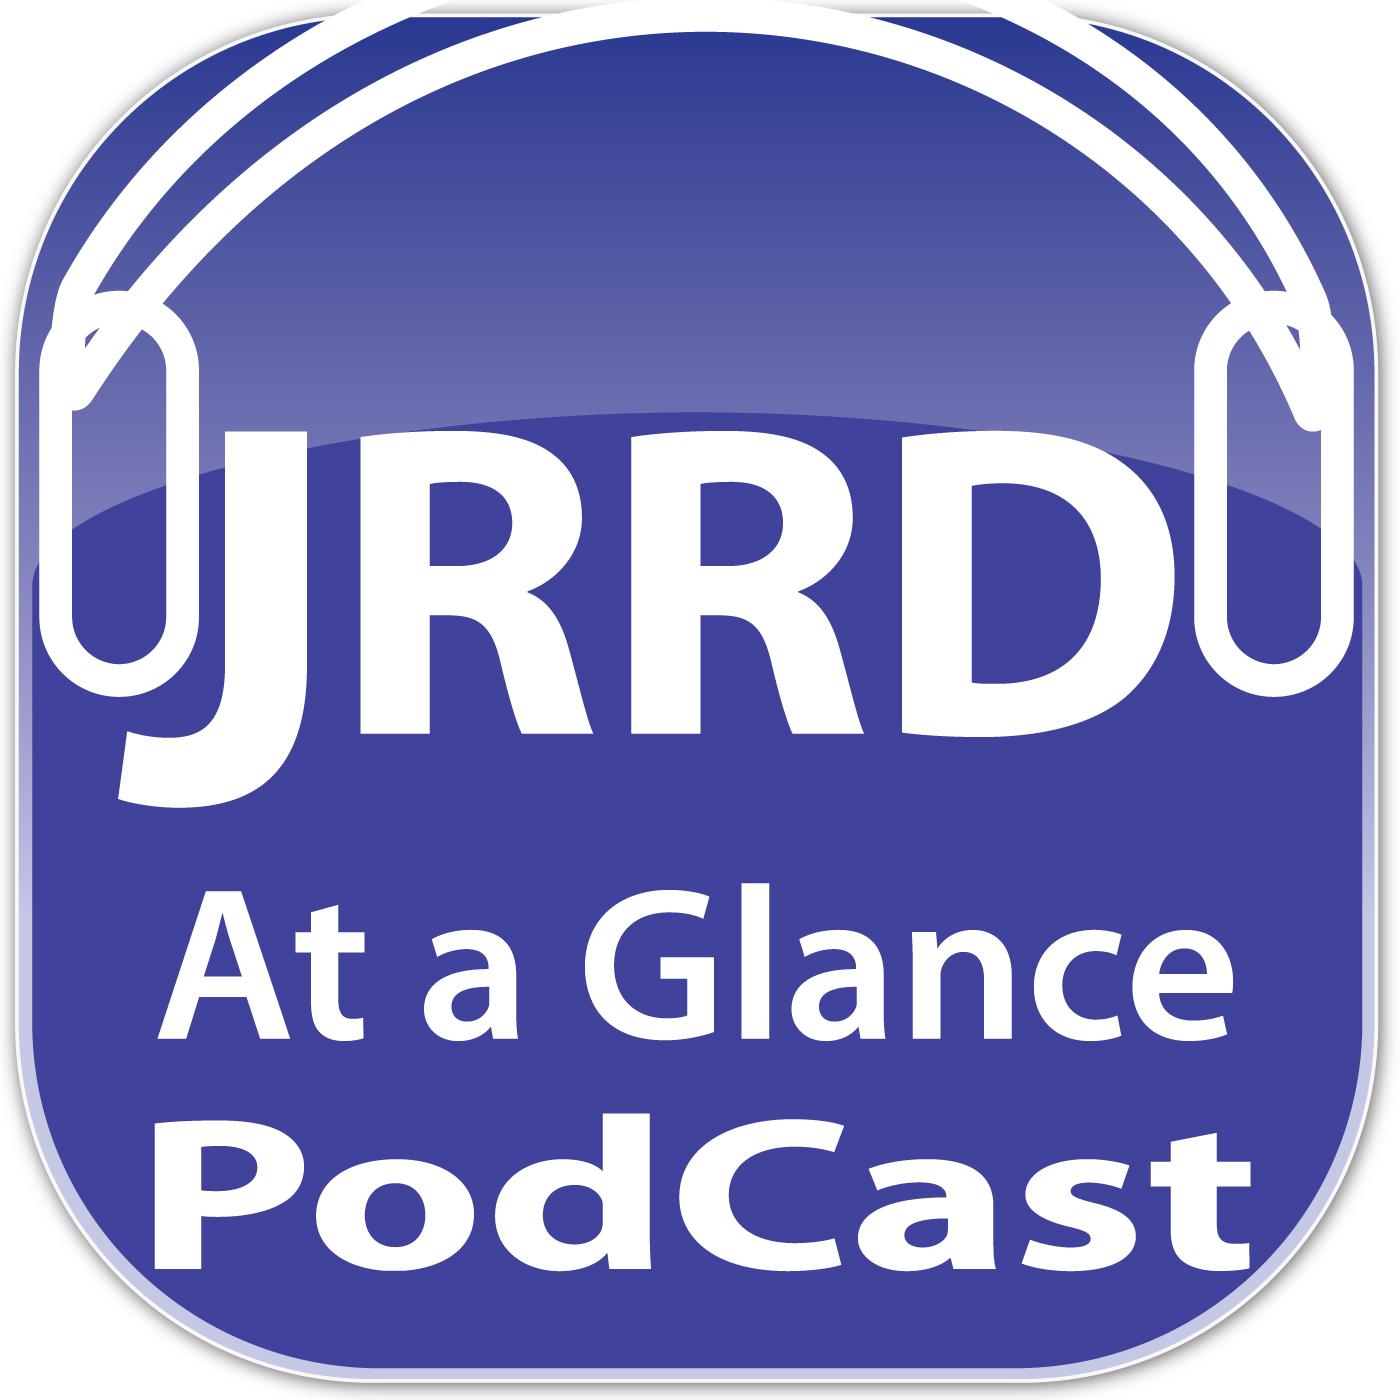 JRRD At a Glance PodCast